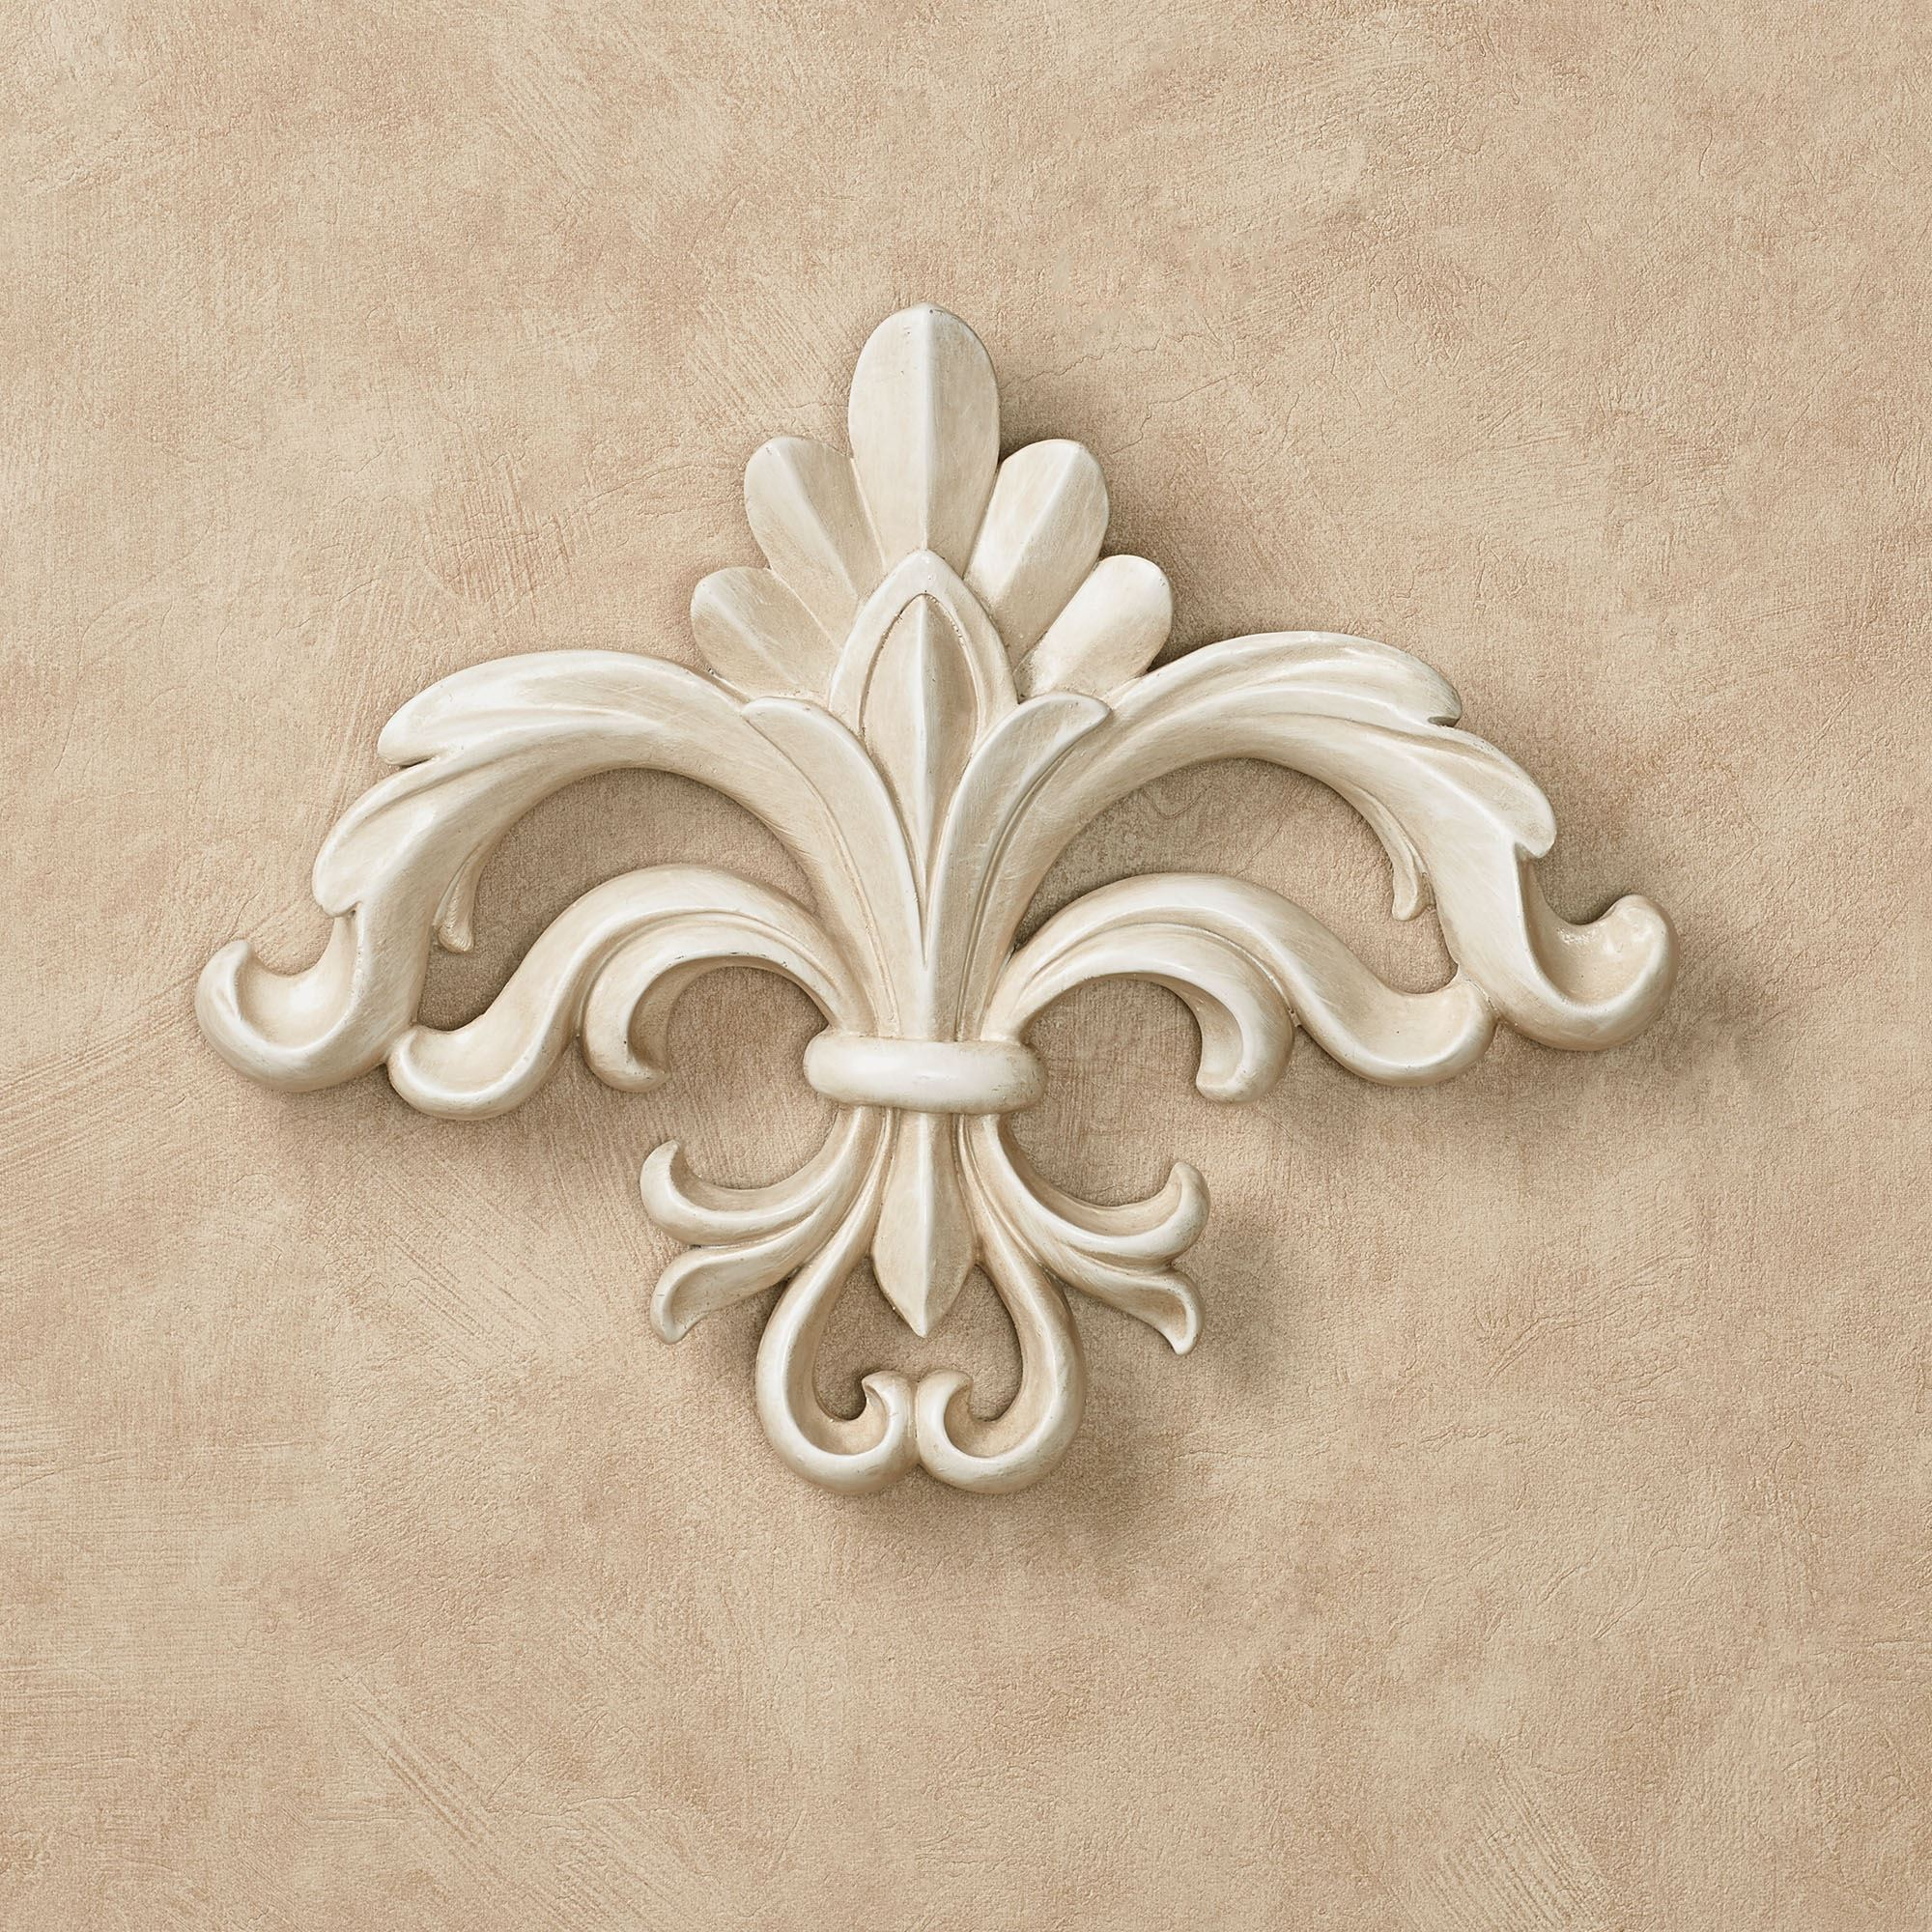 Rhett Antique White Fleur De Lis Wall Accent